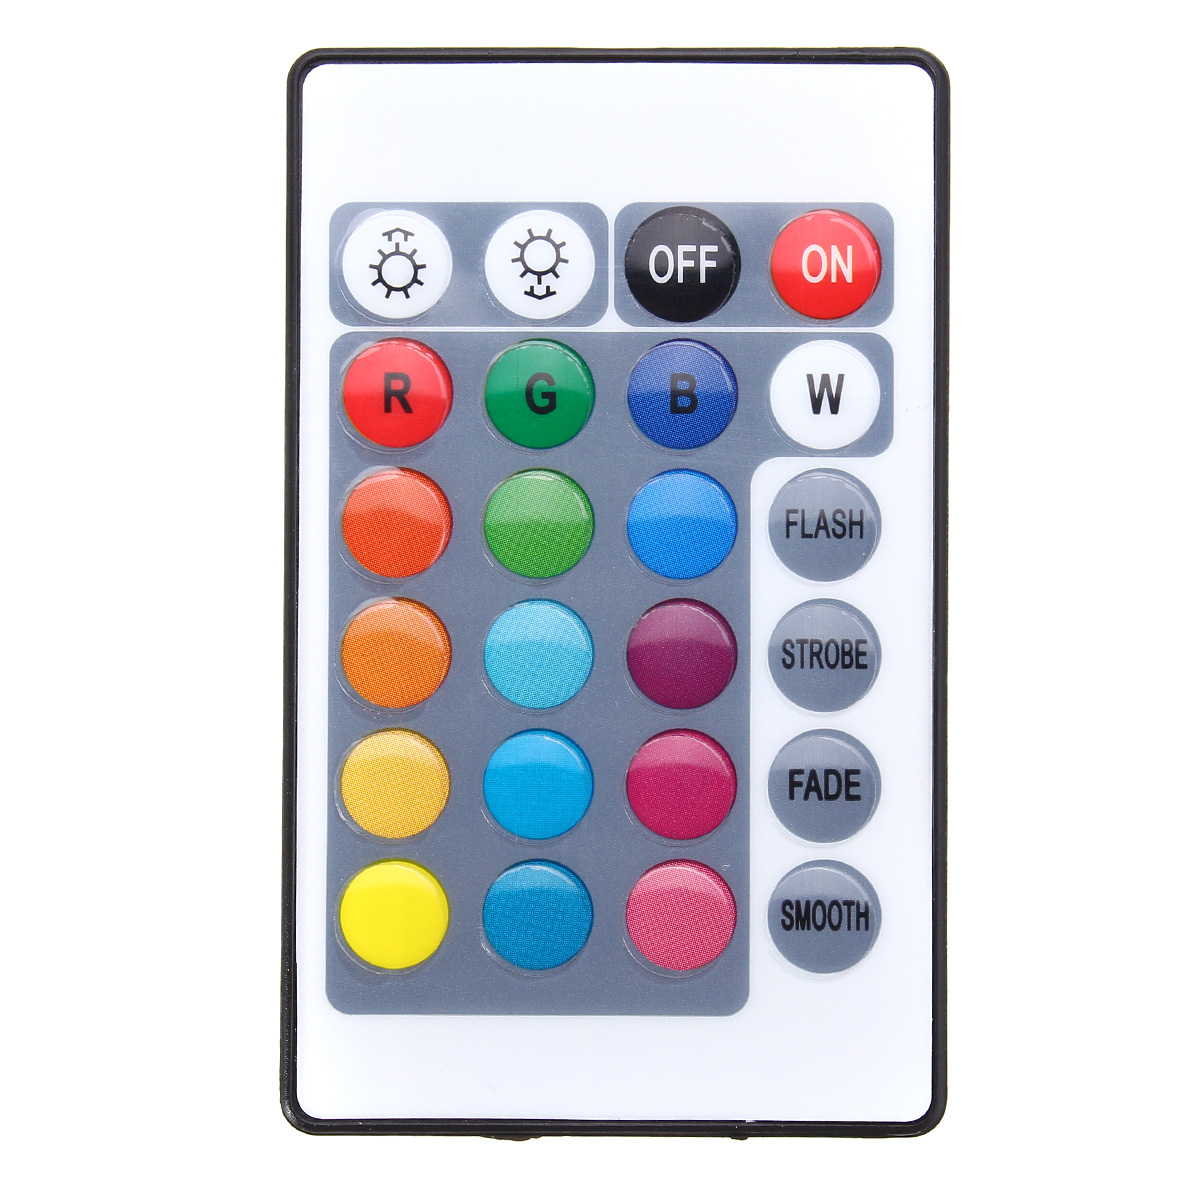 24 Keys USB LED Controller with Remote Control for DC5V 5050 RGB Strip Light